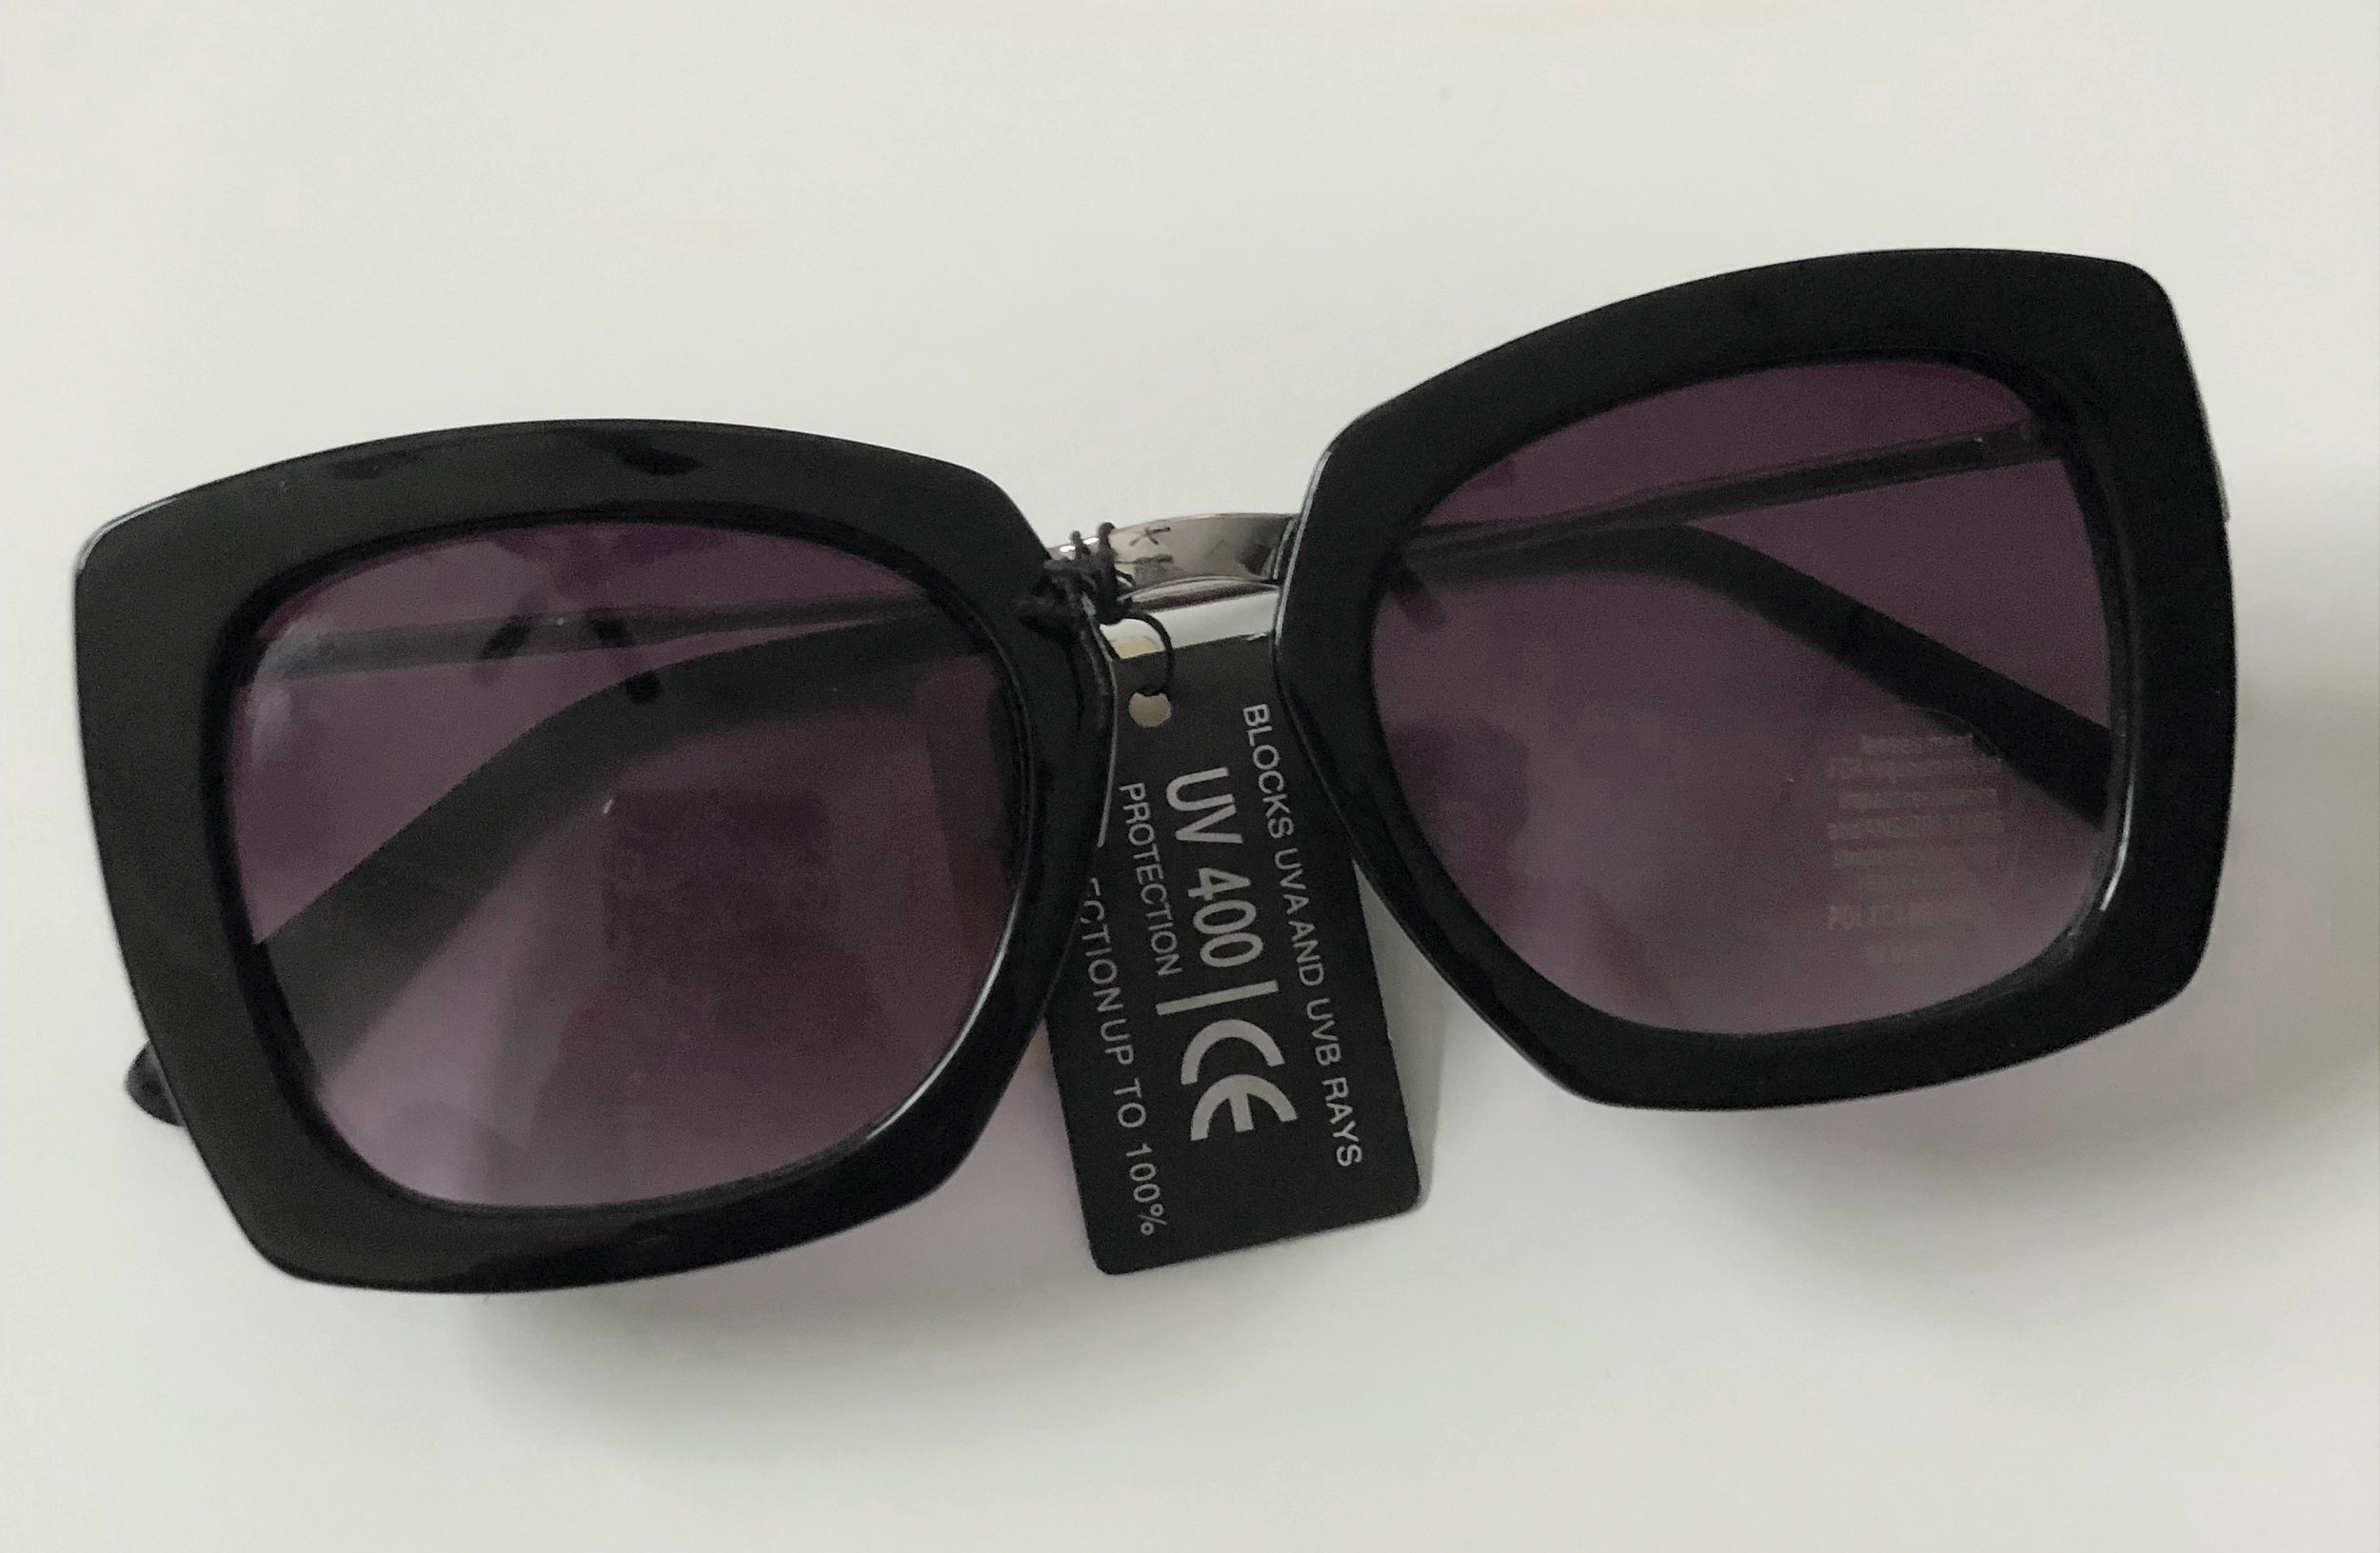 Sunglasses $9.50 I love some good shades!